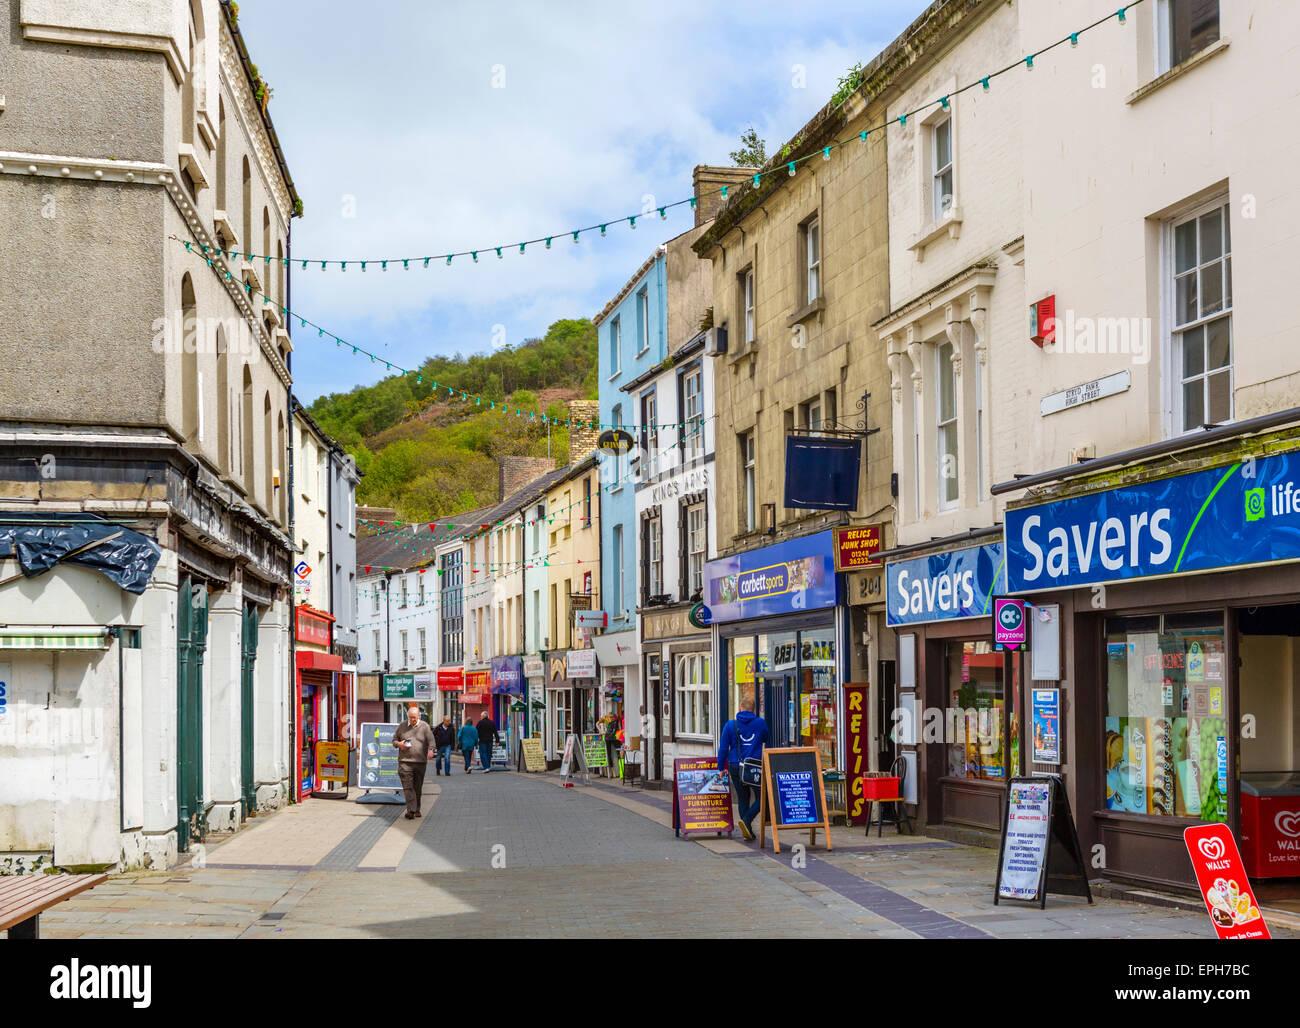 High Street in Bangor, Gwynedd, Wales, UK - Stock Image